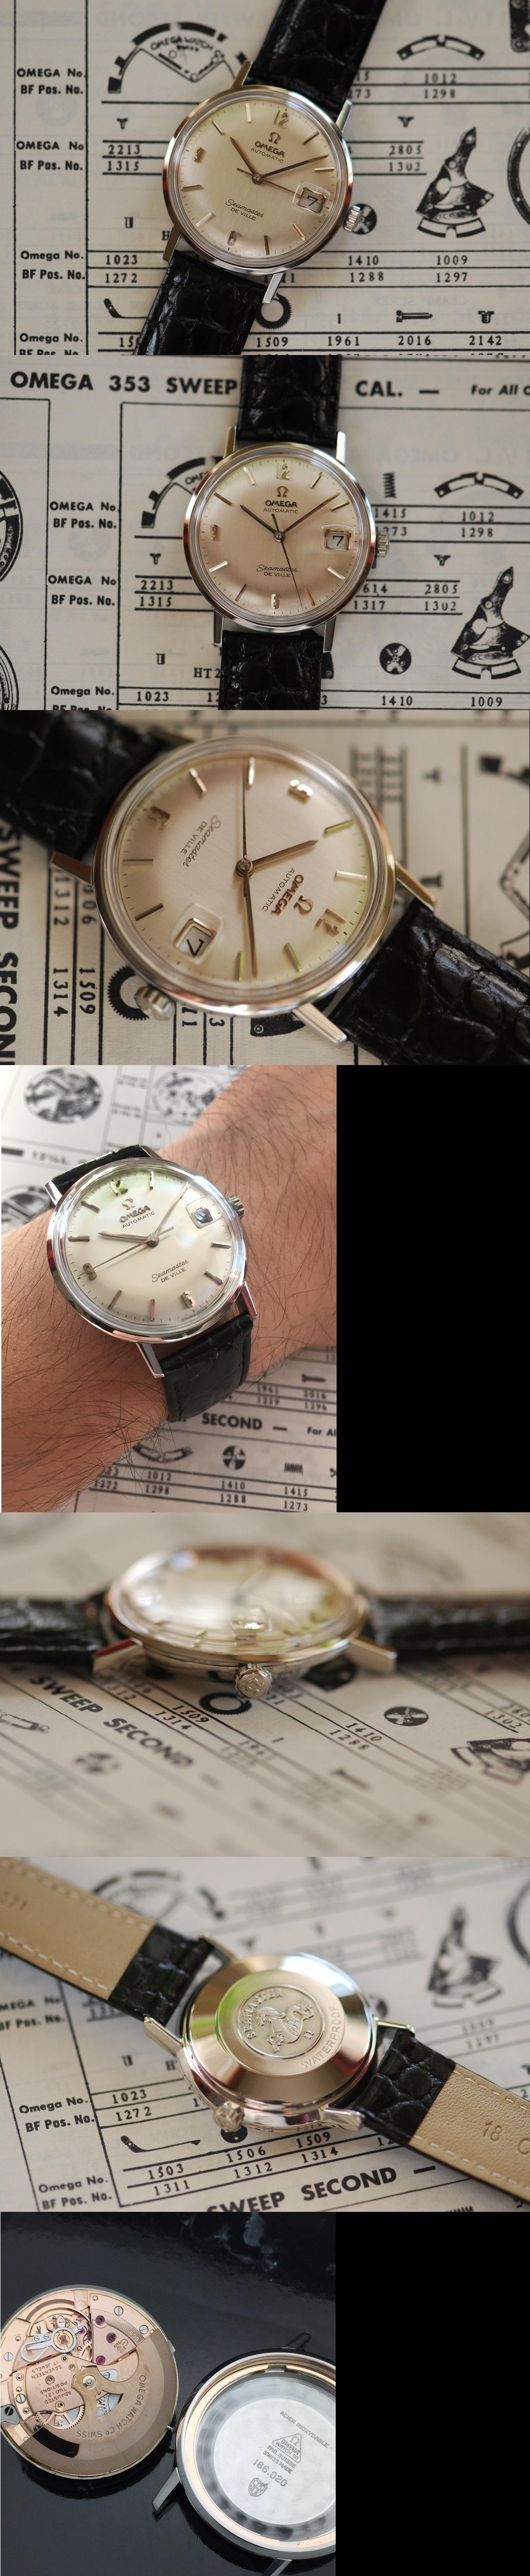 1964 Omega Seamaster DeVille Automatic Vintage Gent's Watch Vintage